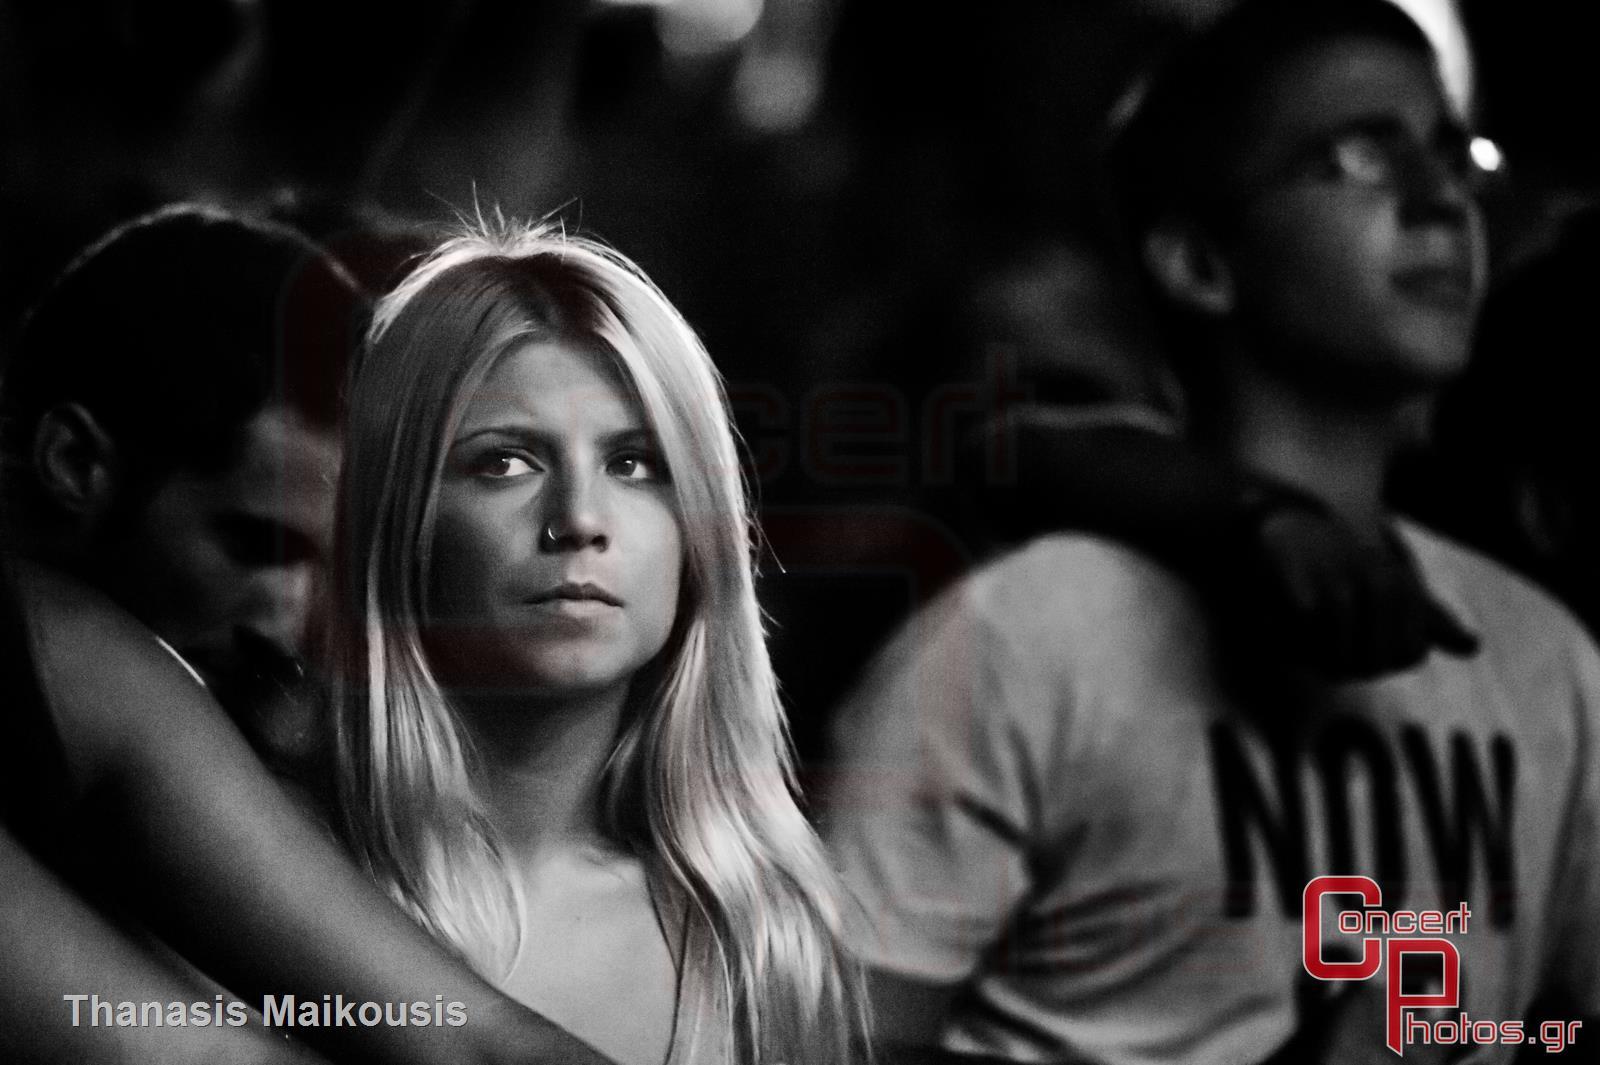 Active Member - Τραγούδα μας να φύγει το σκοτάδι- photographer: Thanasis Maikousis - concertphotos_-5350